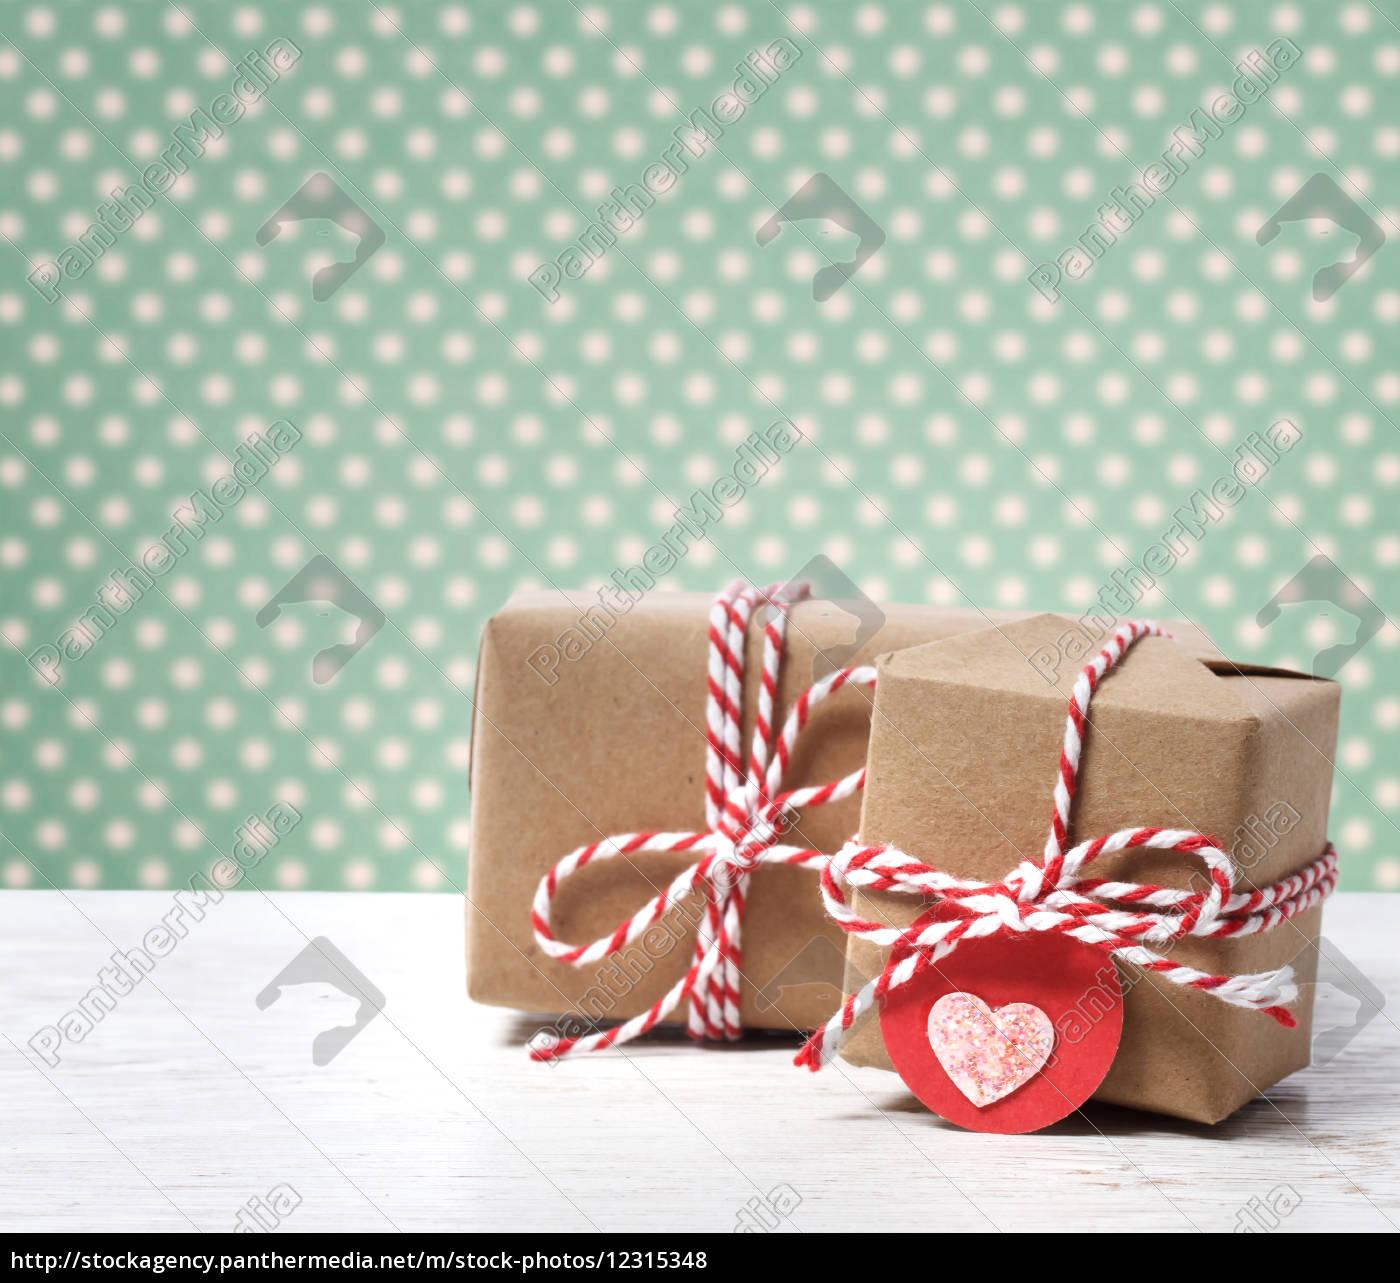 handgemachte geschenk-boxen - Lizenzfreies Foto - #12315348 ...